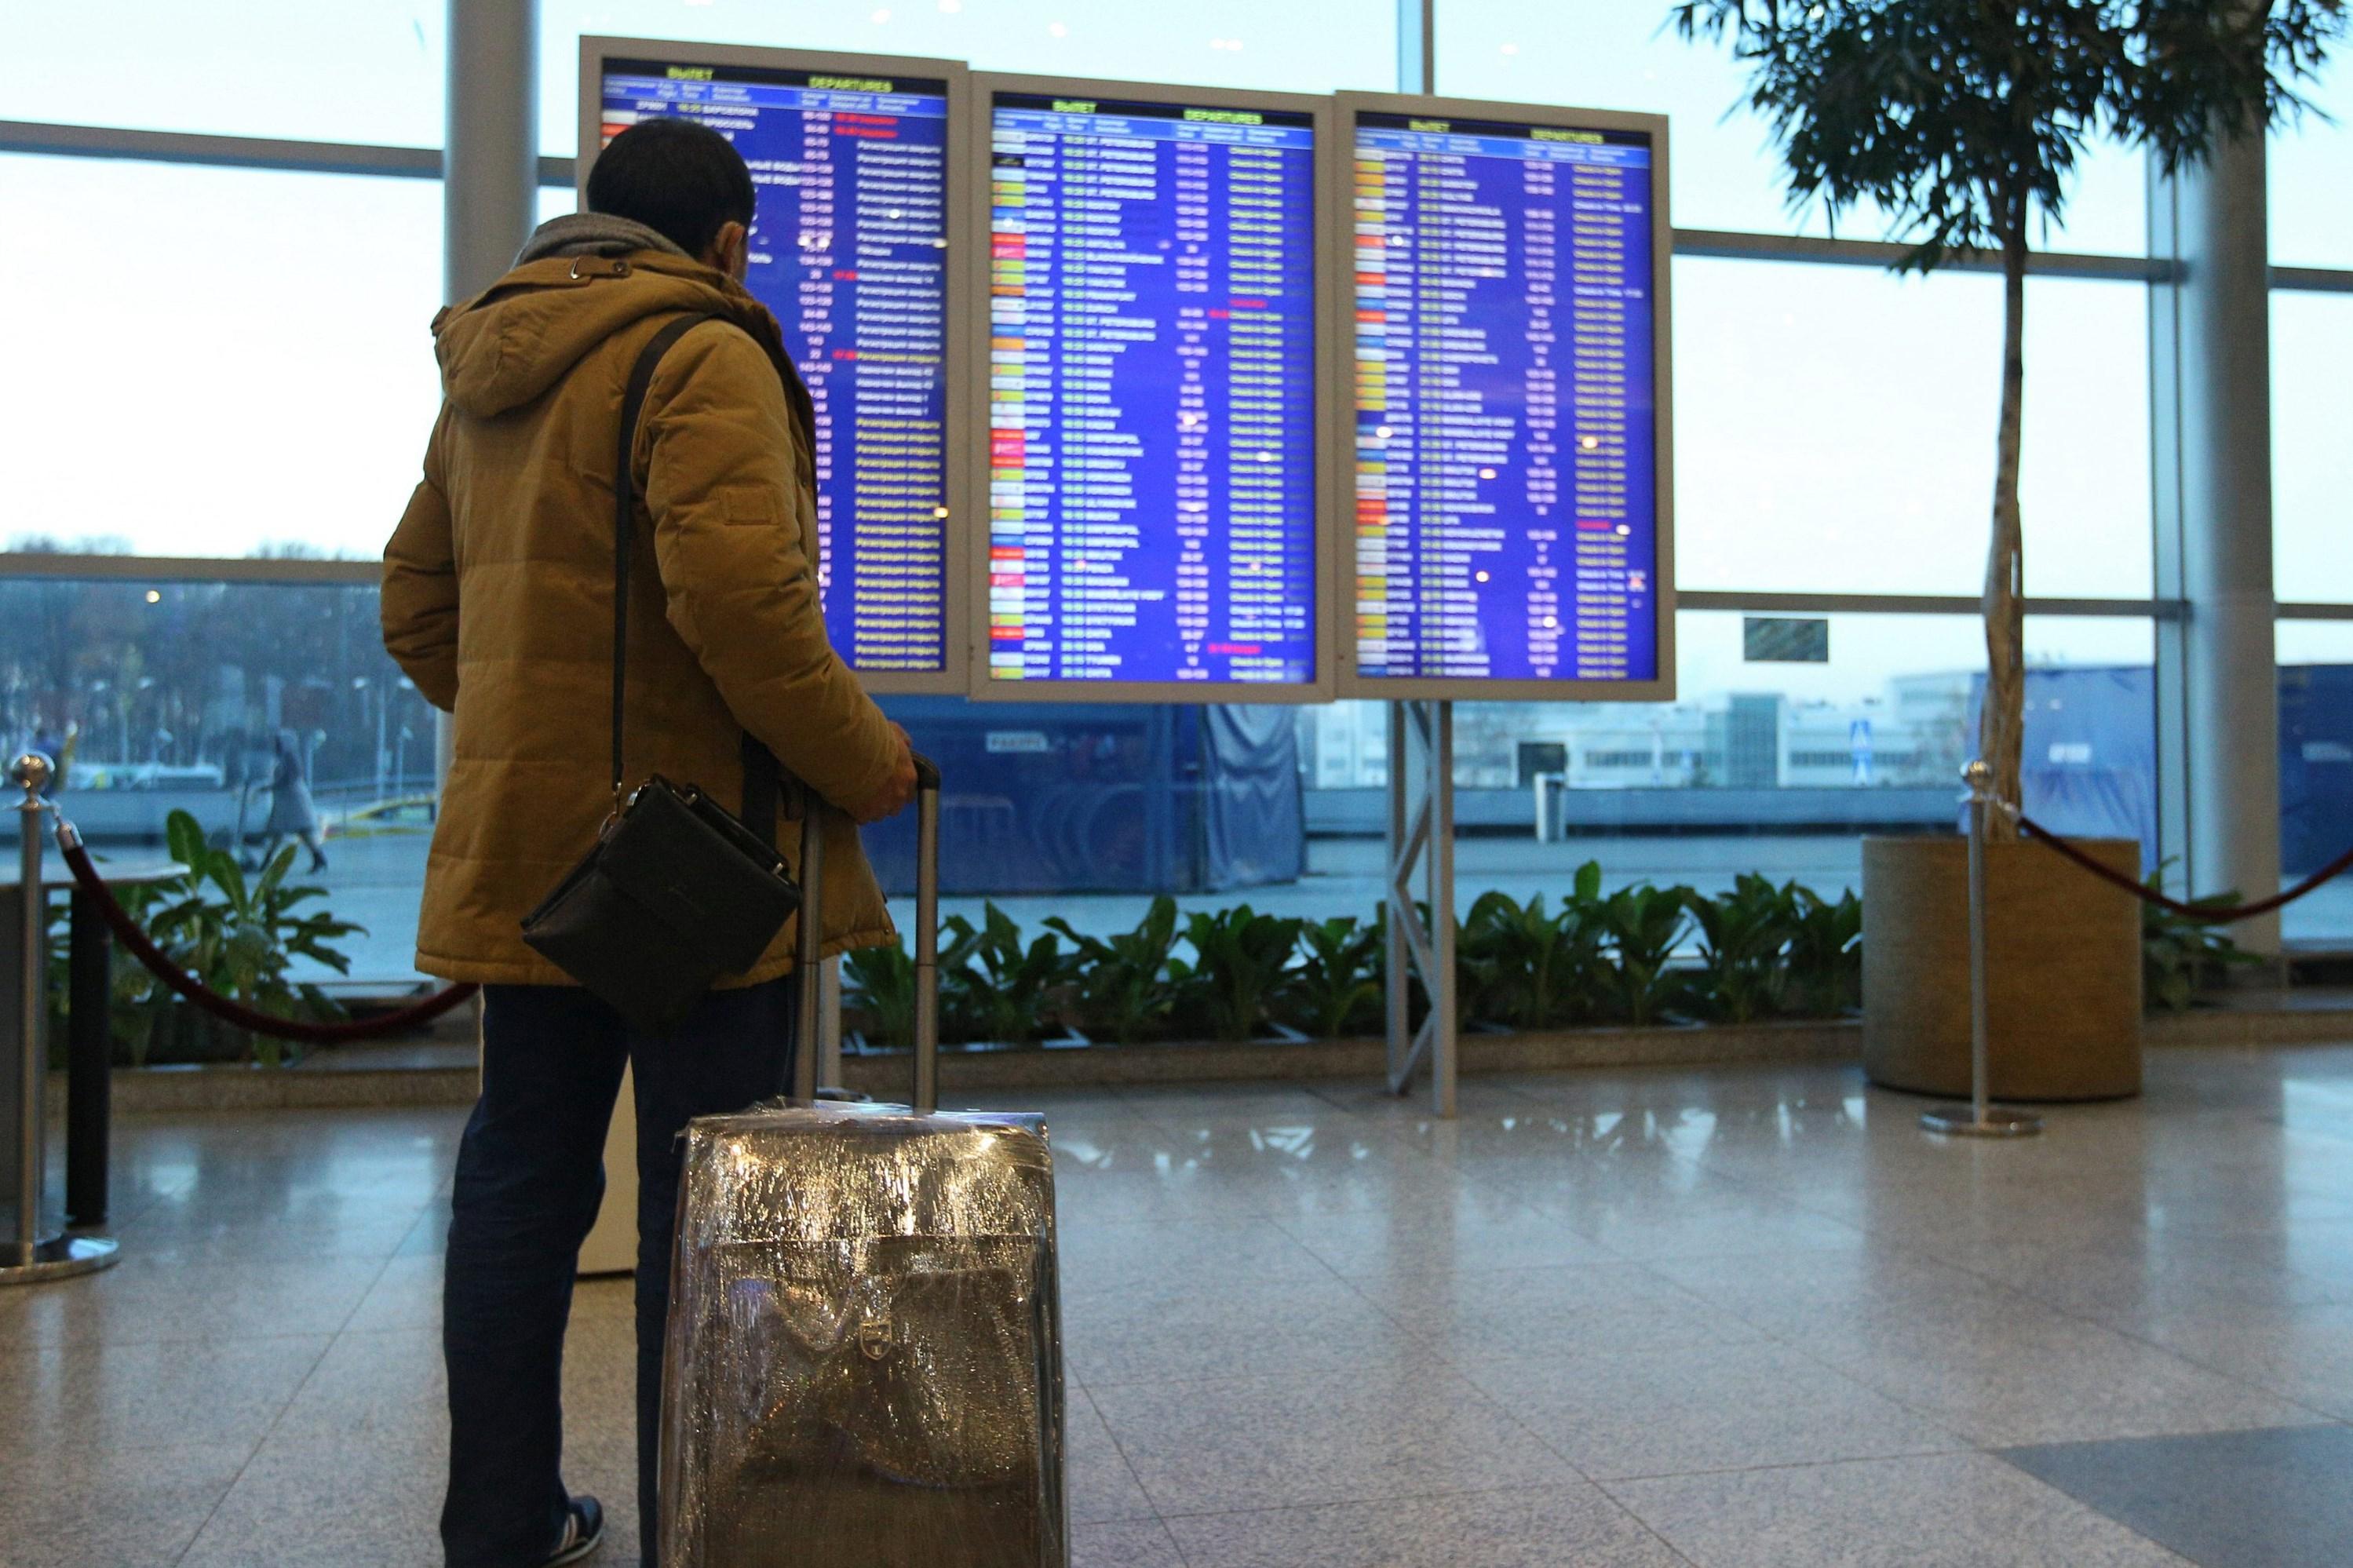 Ситуация в аэропортах Москвы